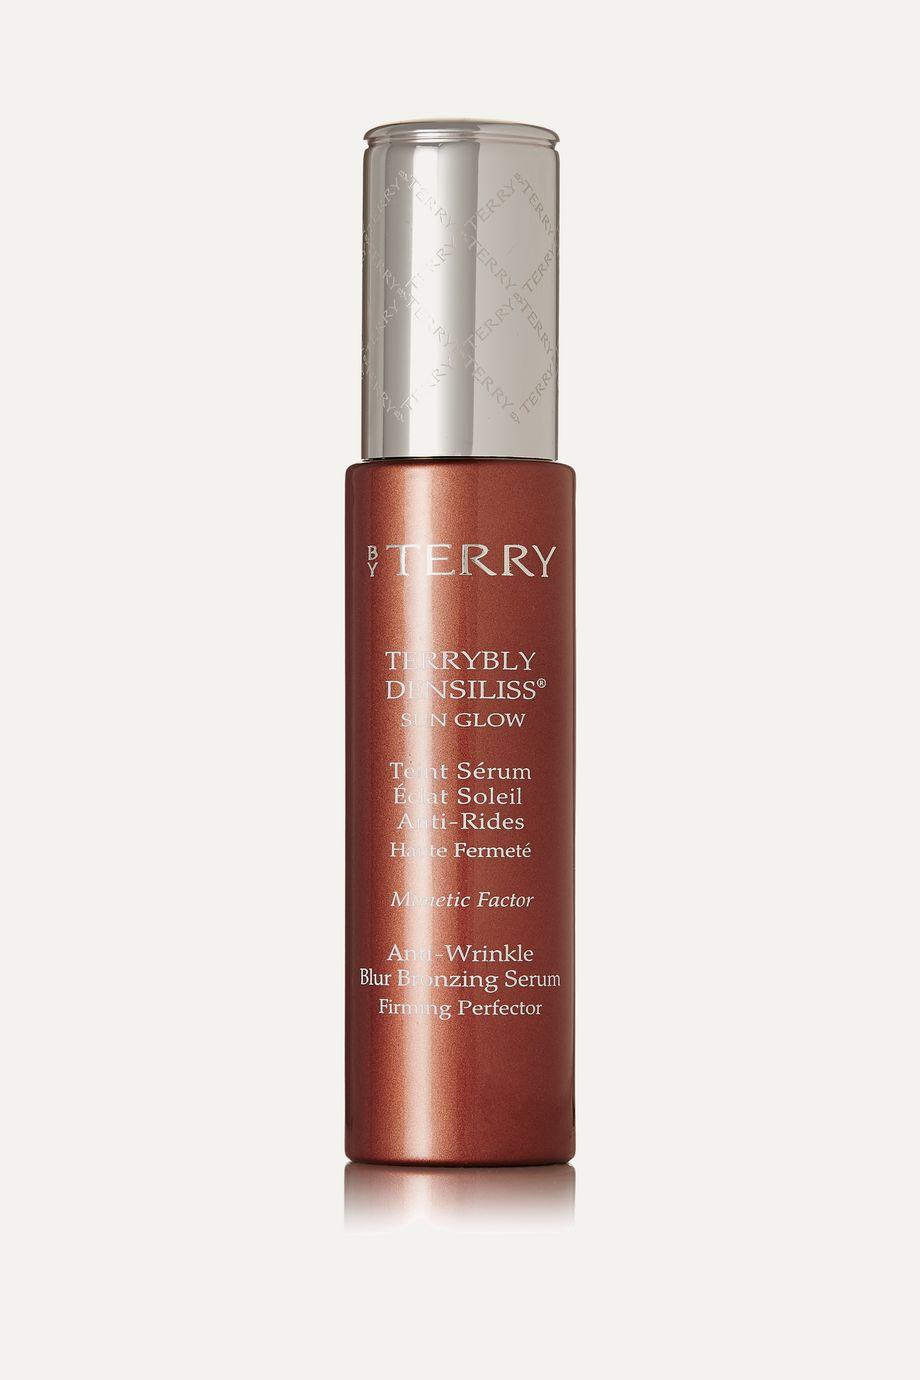 BY TERRY Terrybly Densiliss® Sun Glow - Sun Nude 2, 30ml